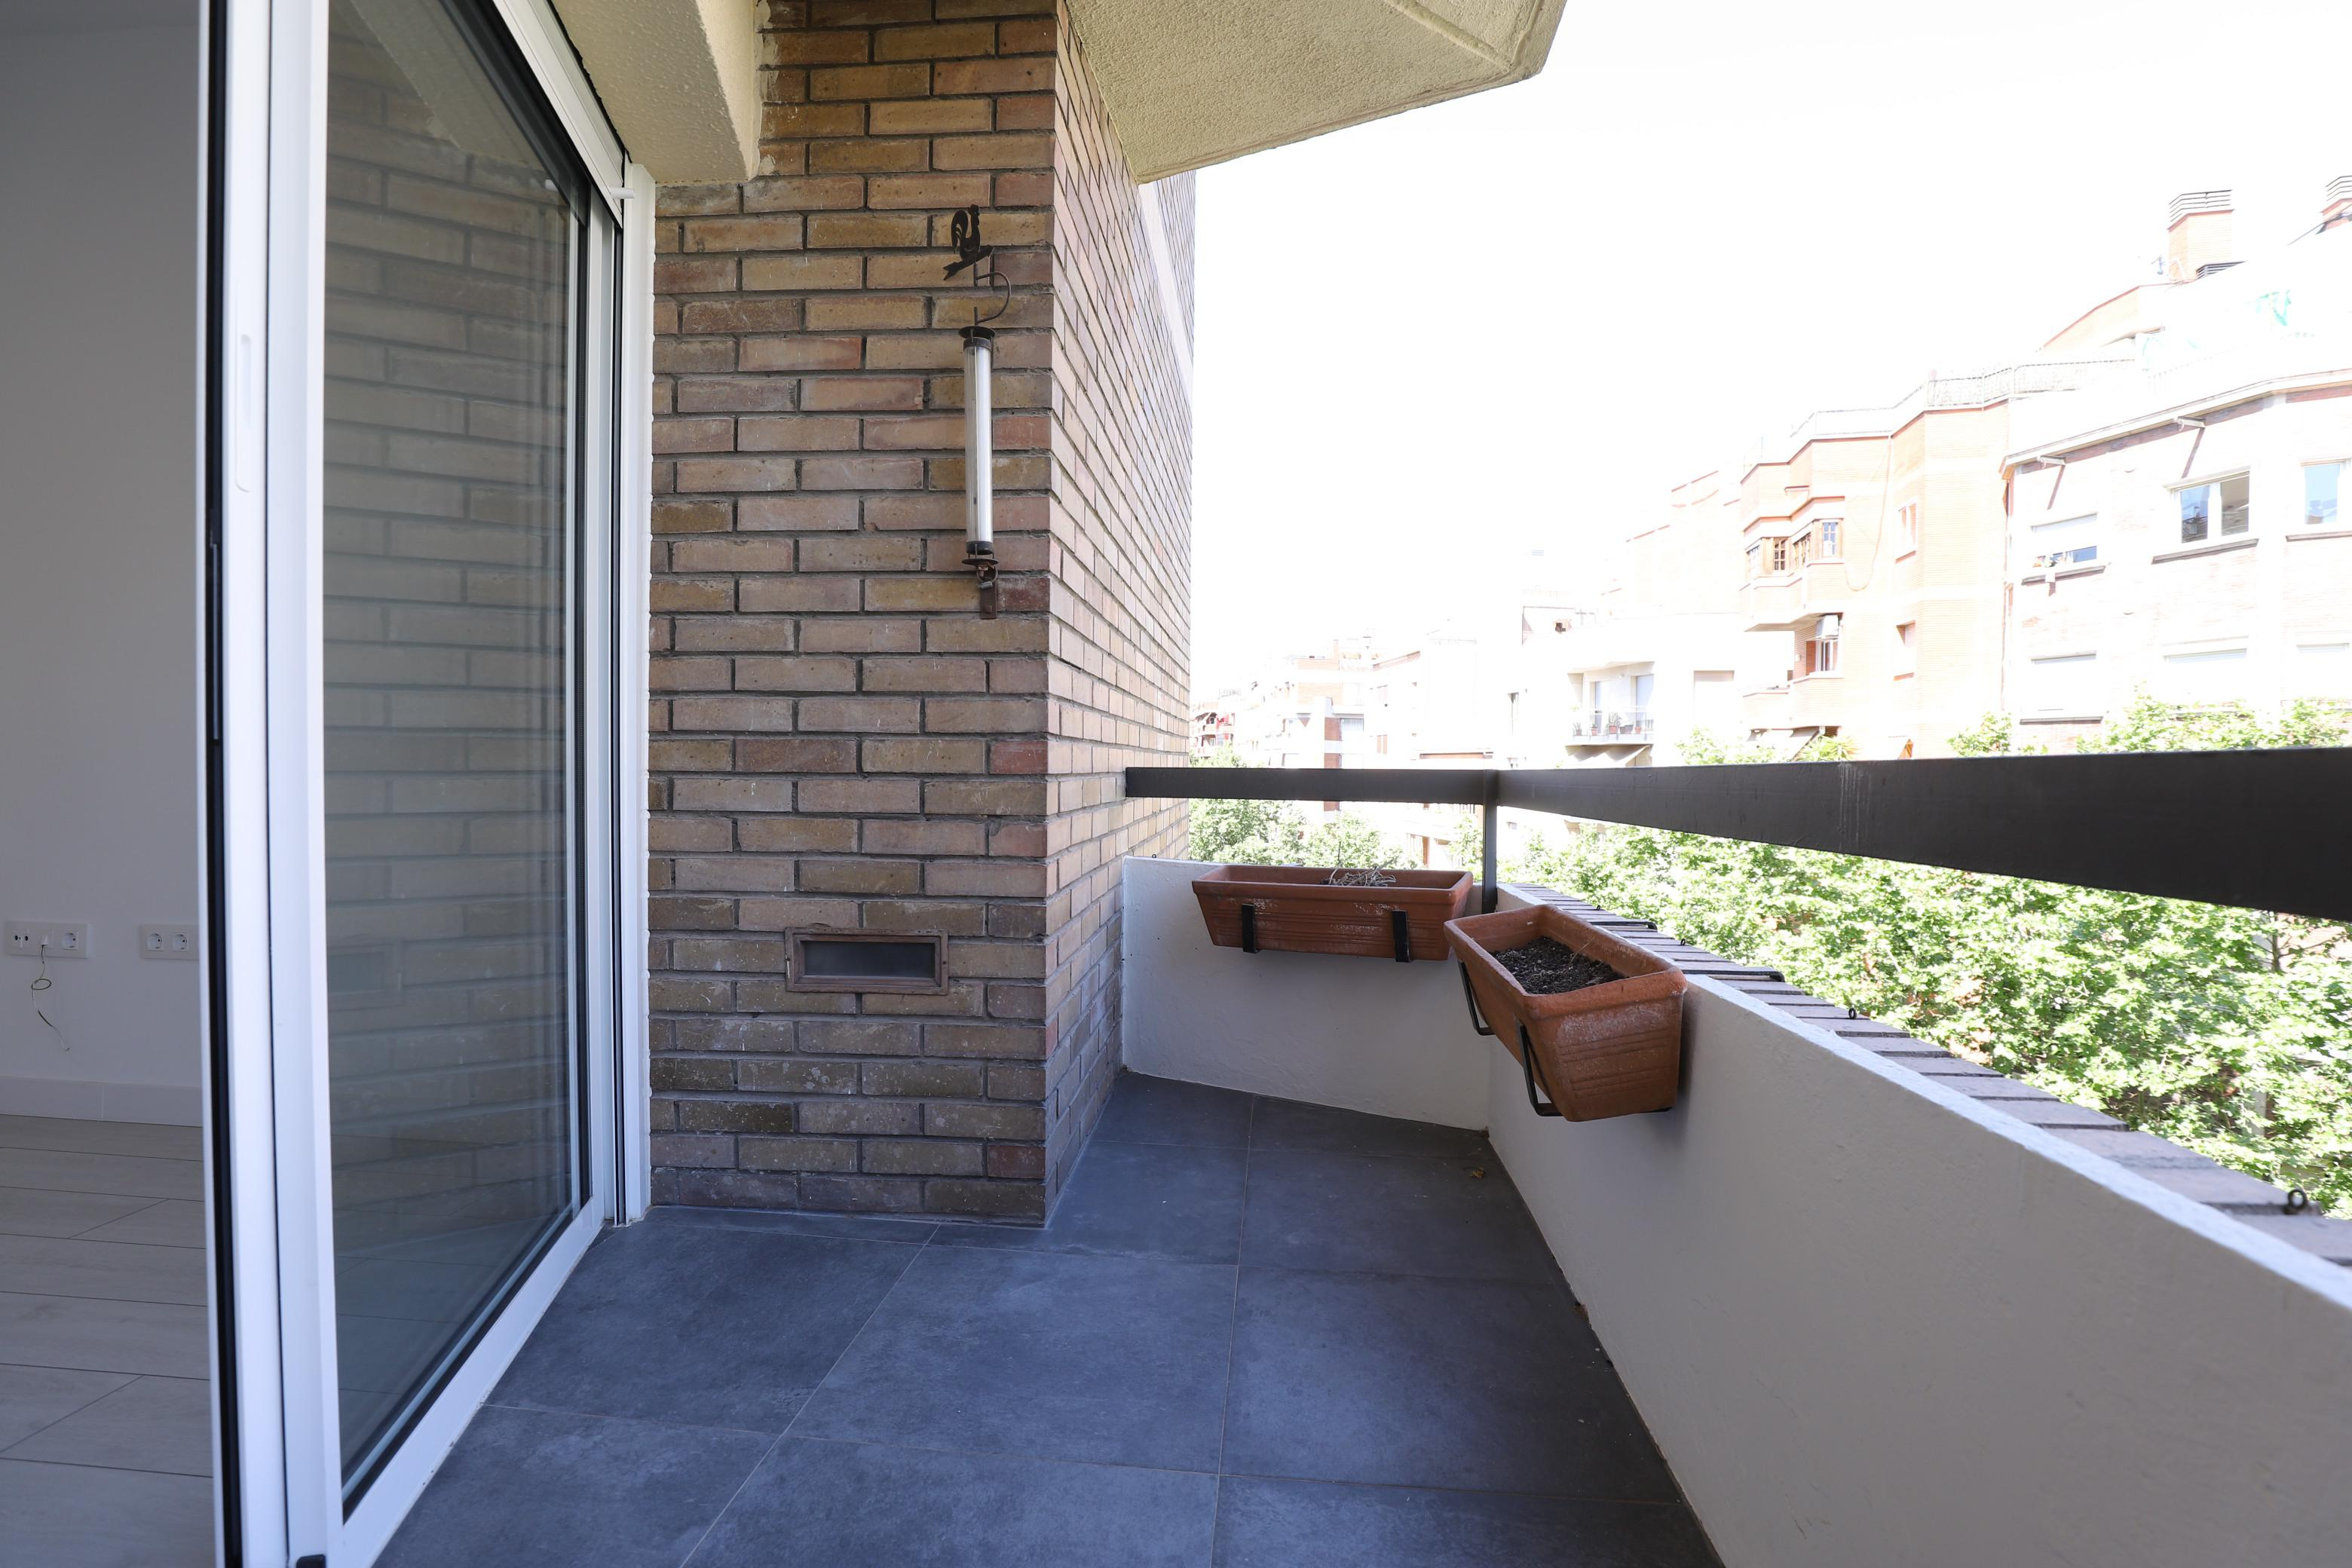 Imagen 1 Piso en alquiler en Barcelona / Cerca Estacion de Sants- Monjuic